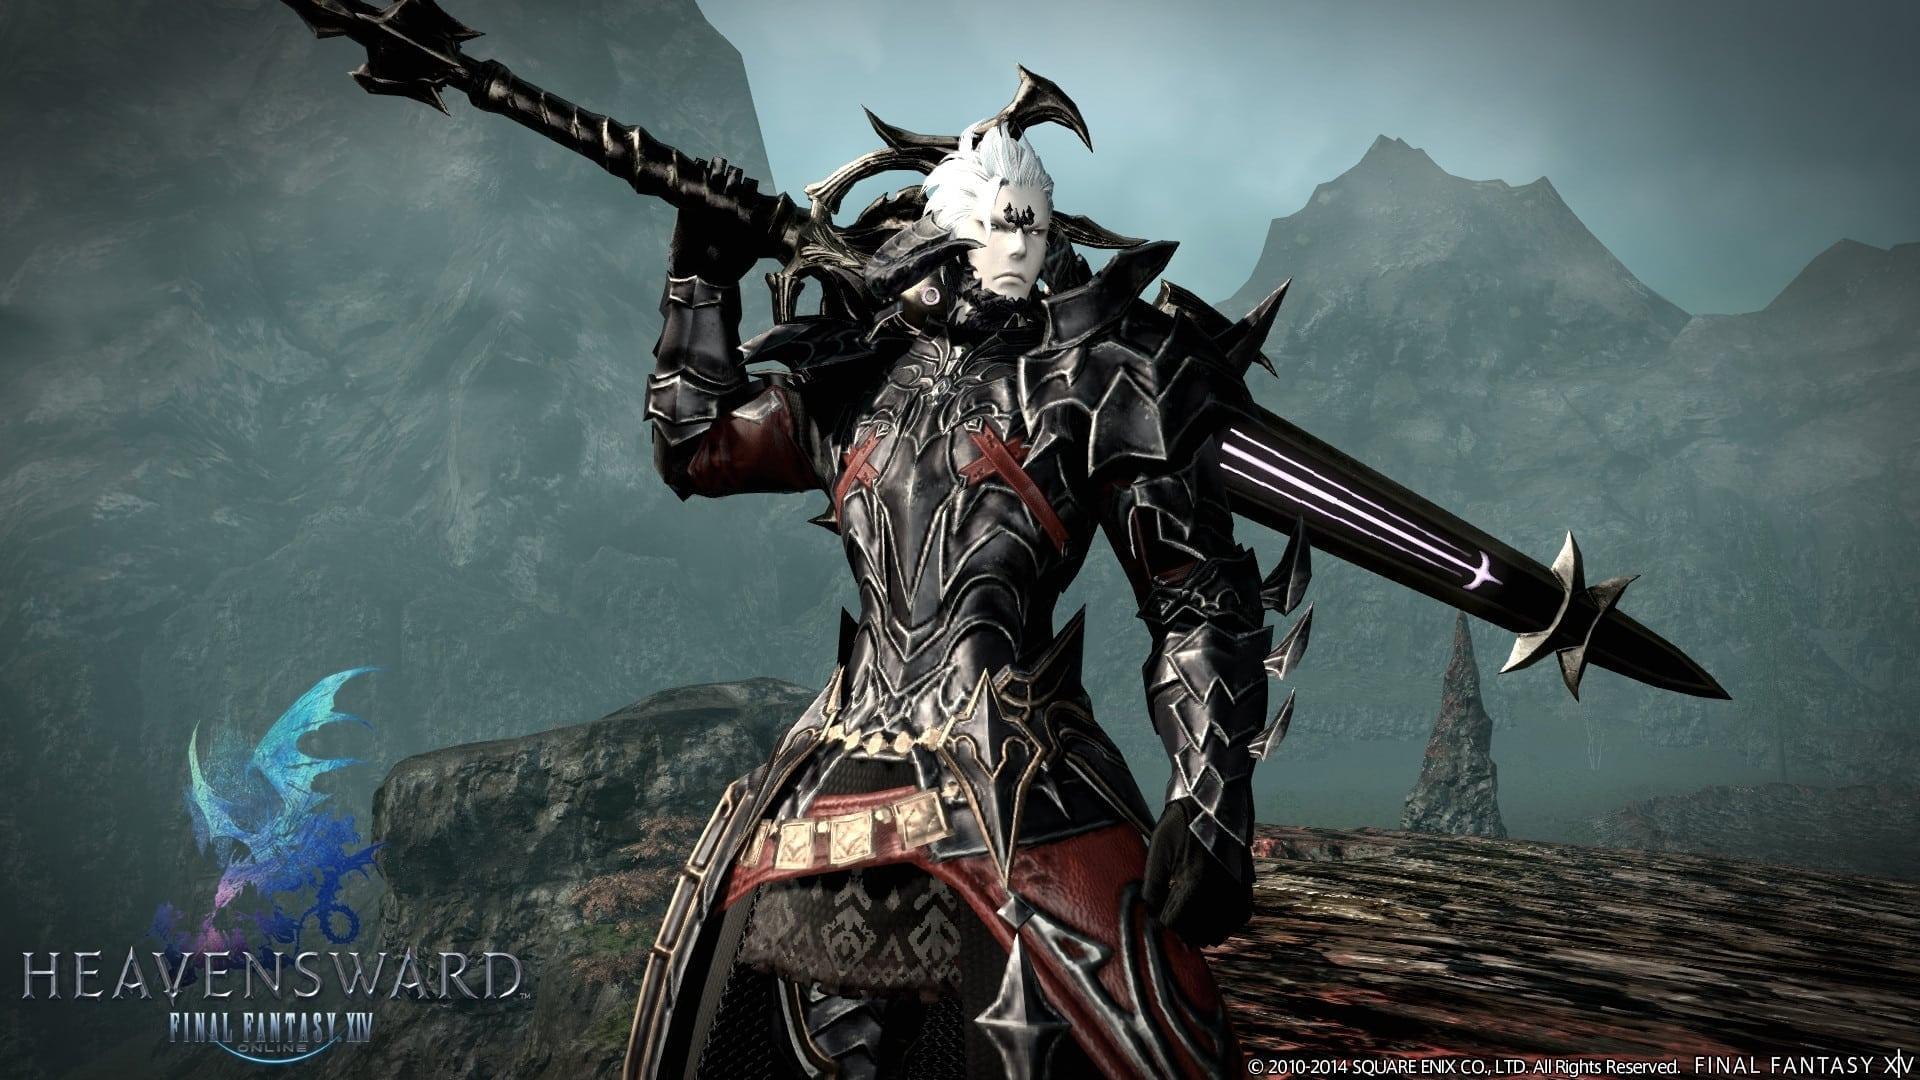 Final Fantasy XIV: Heavensward – Tons of details for game expansion